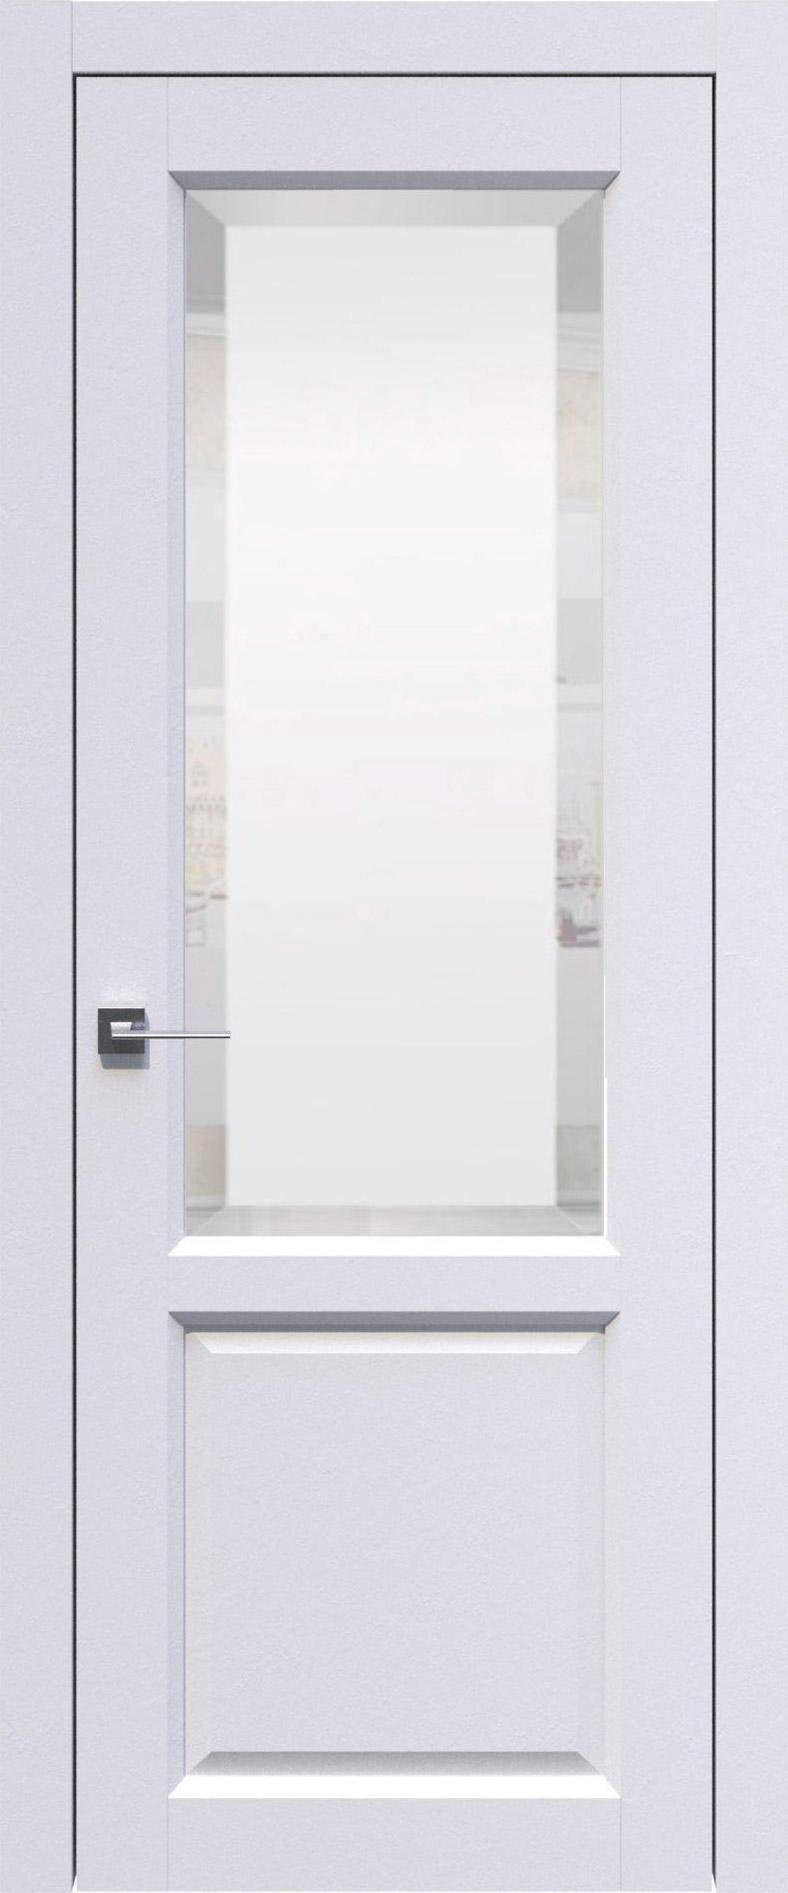 Dinastia цвет - Арктик белый Со стеклом (ДО)